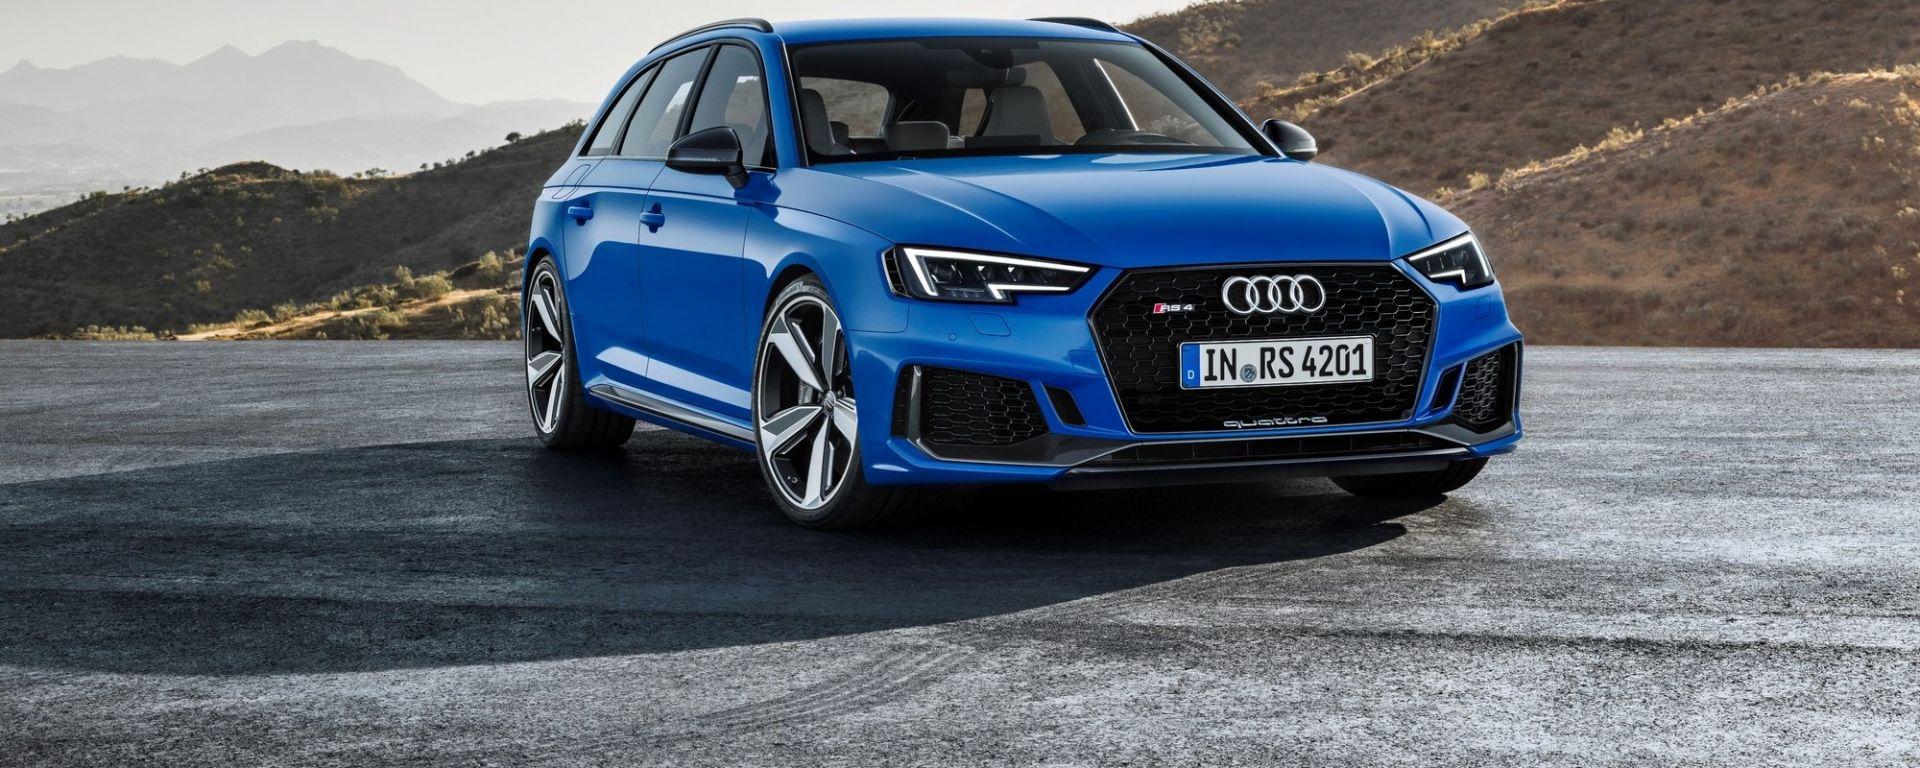 Nuova Audi RS4 Avant: prezzi e allestimenti